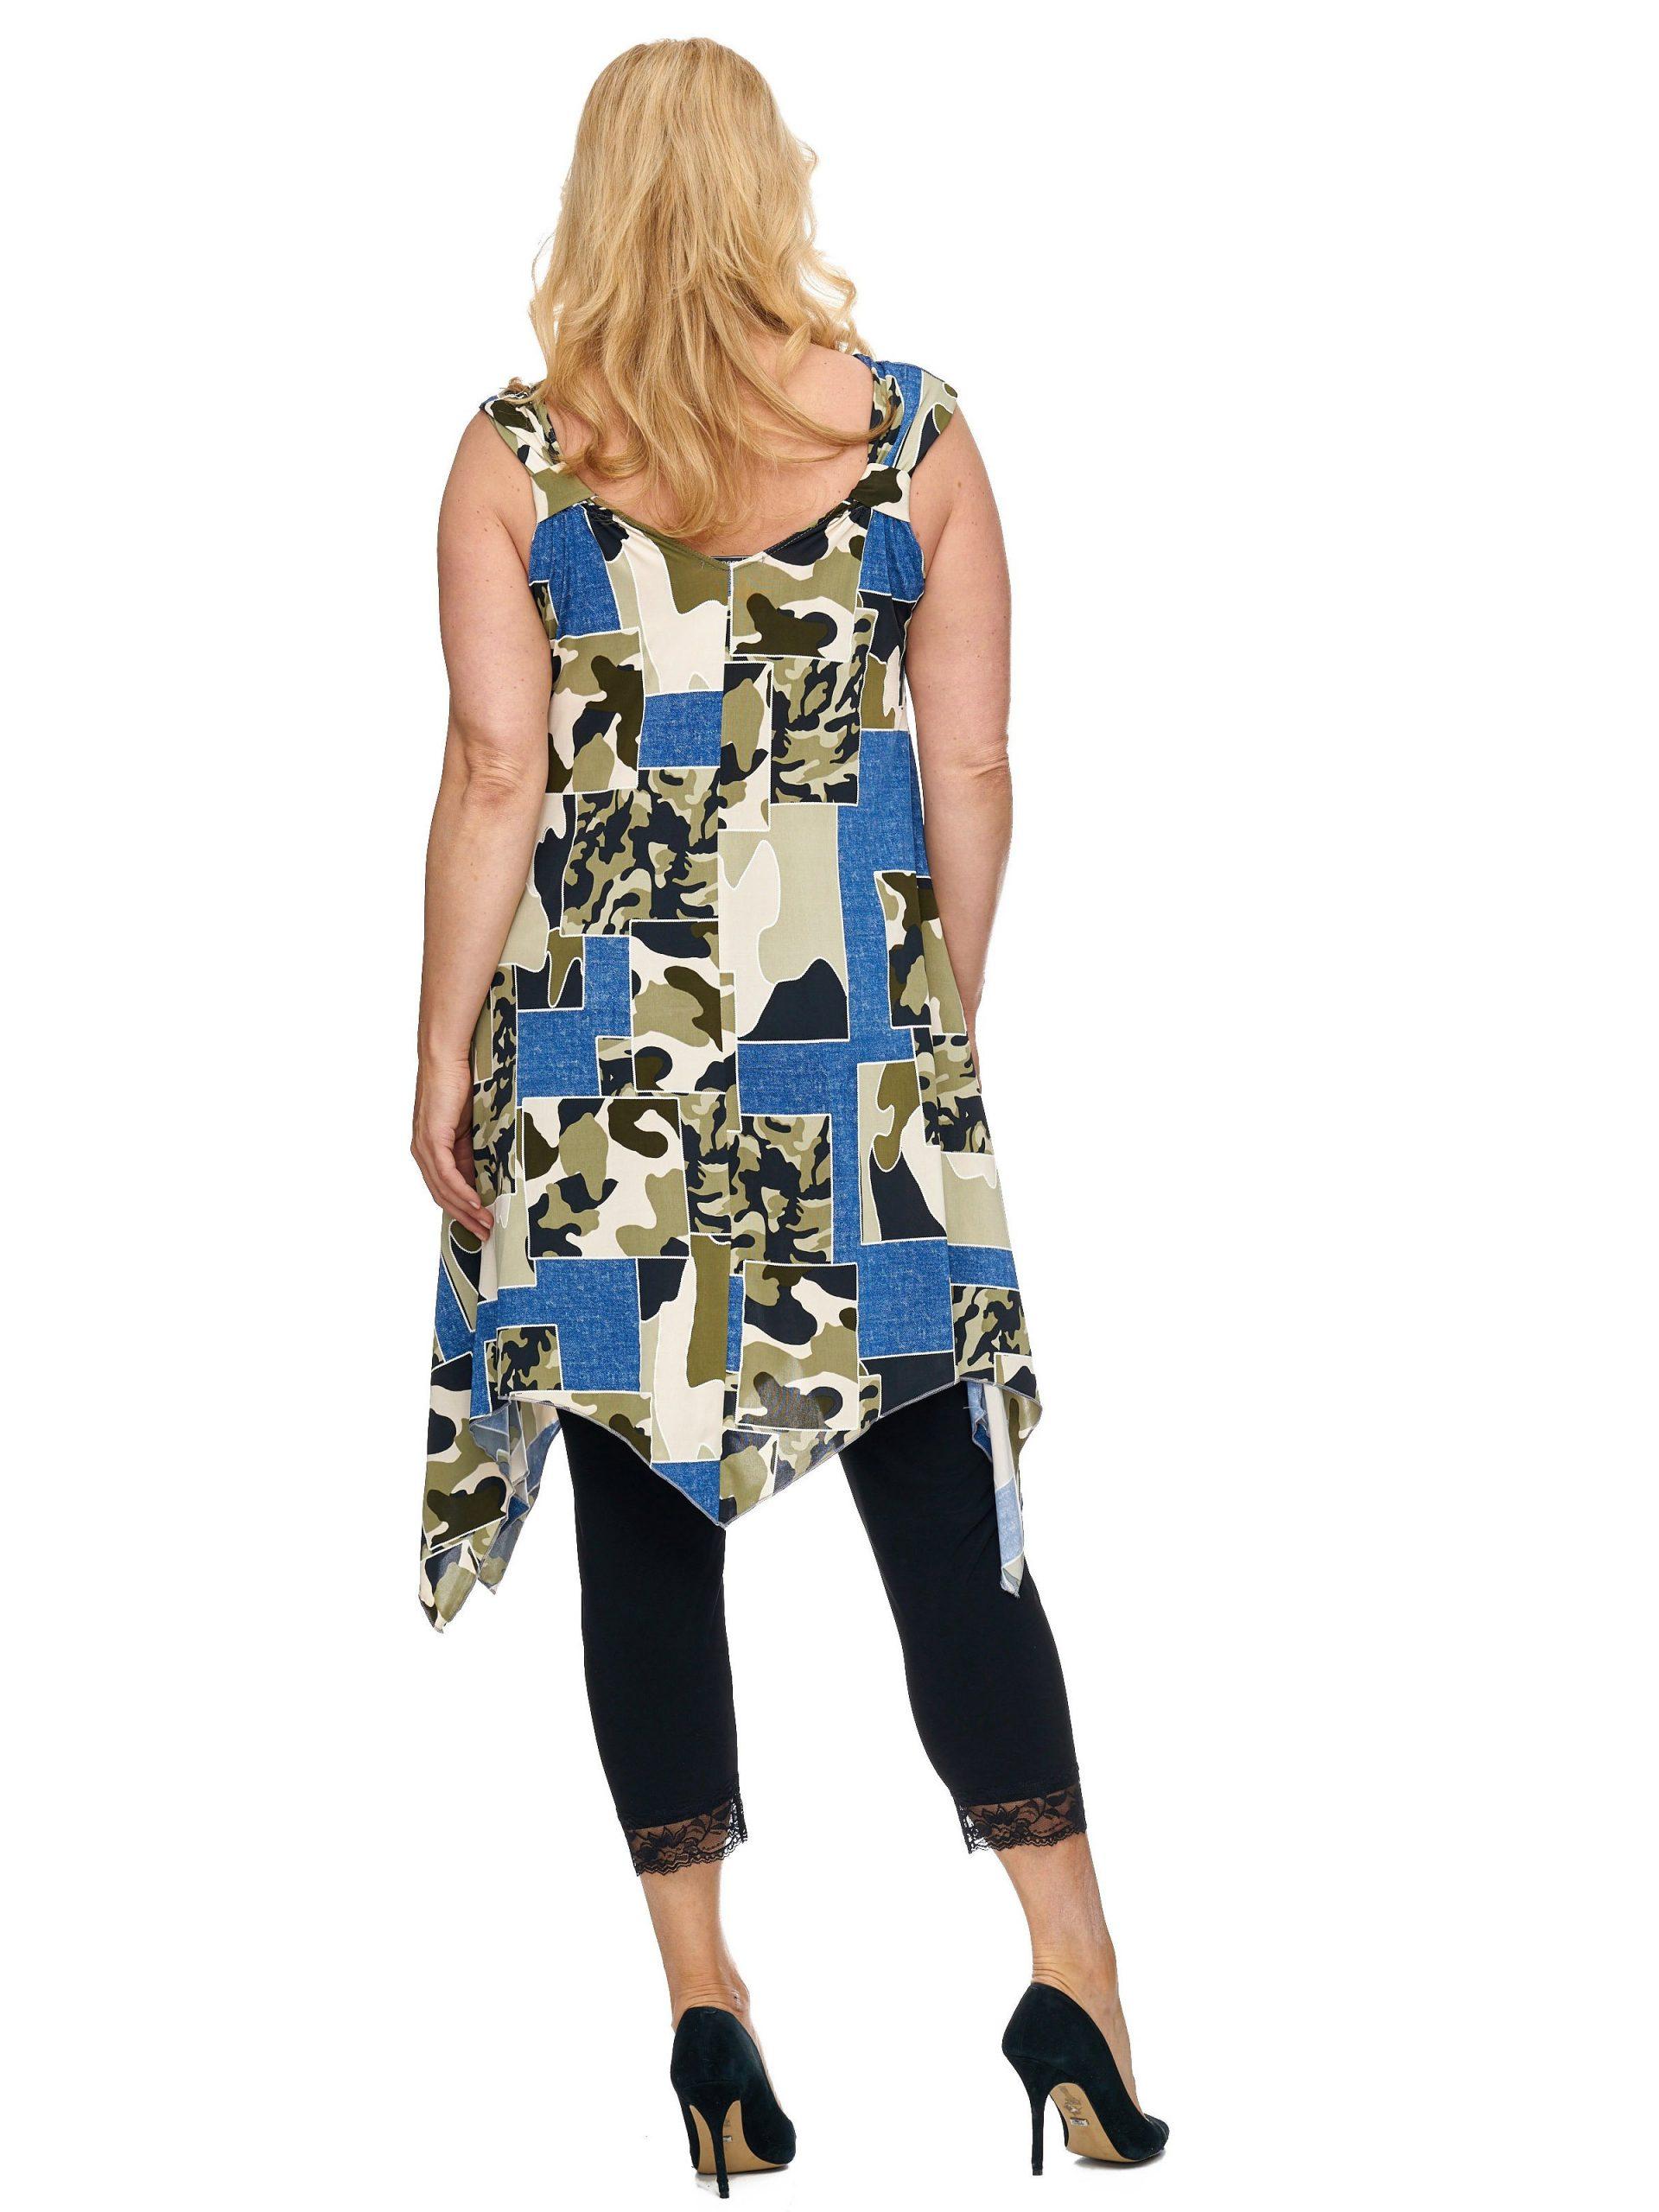 Sexy Alinie Tunika Long Top Kleid Zipfel Camouflage